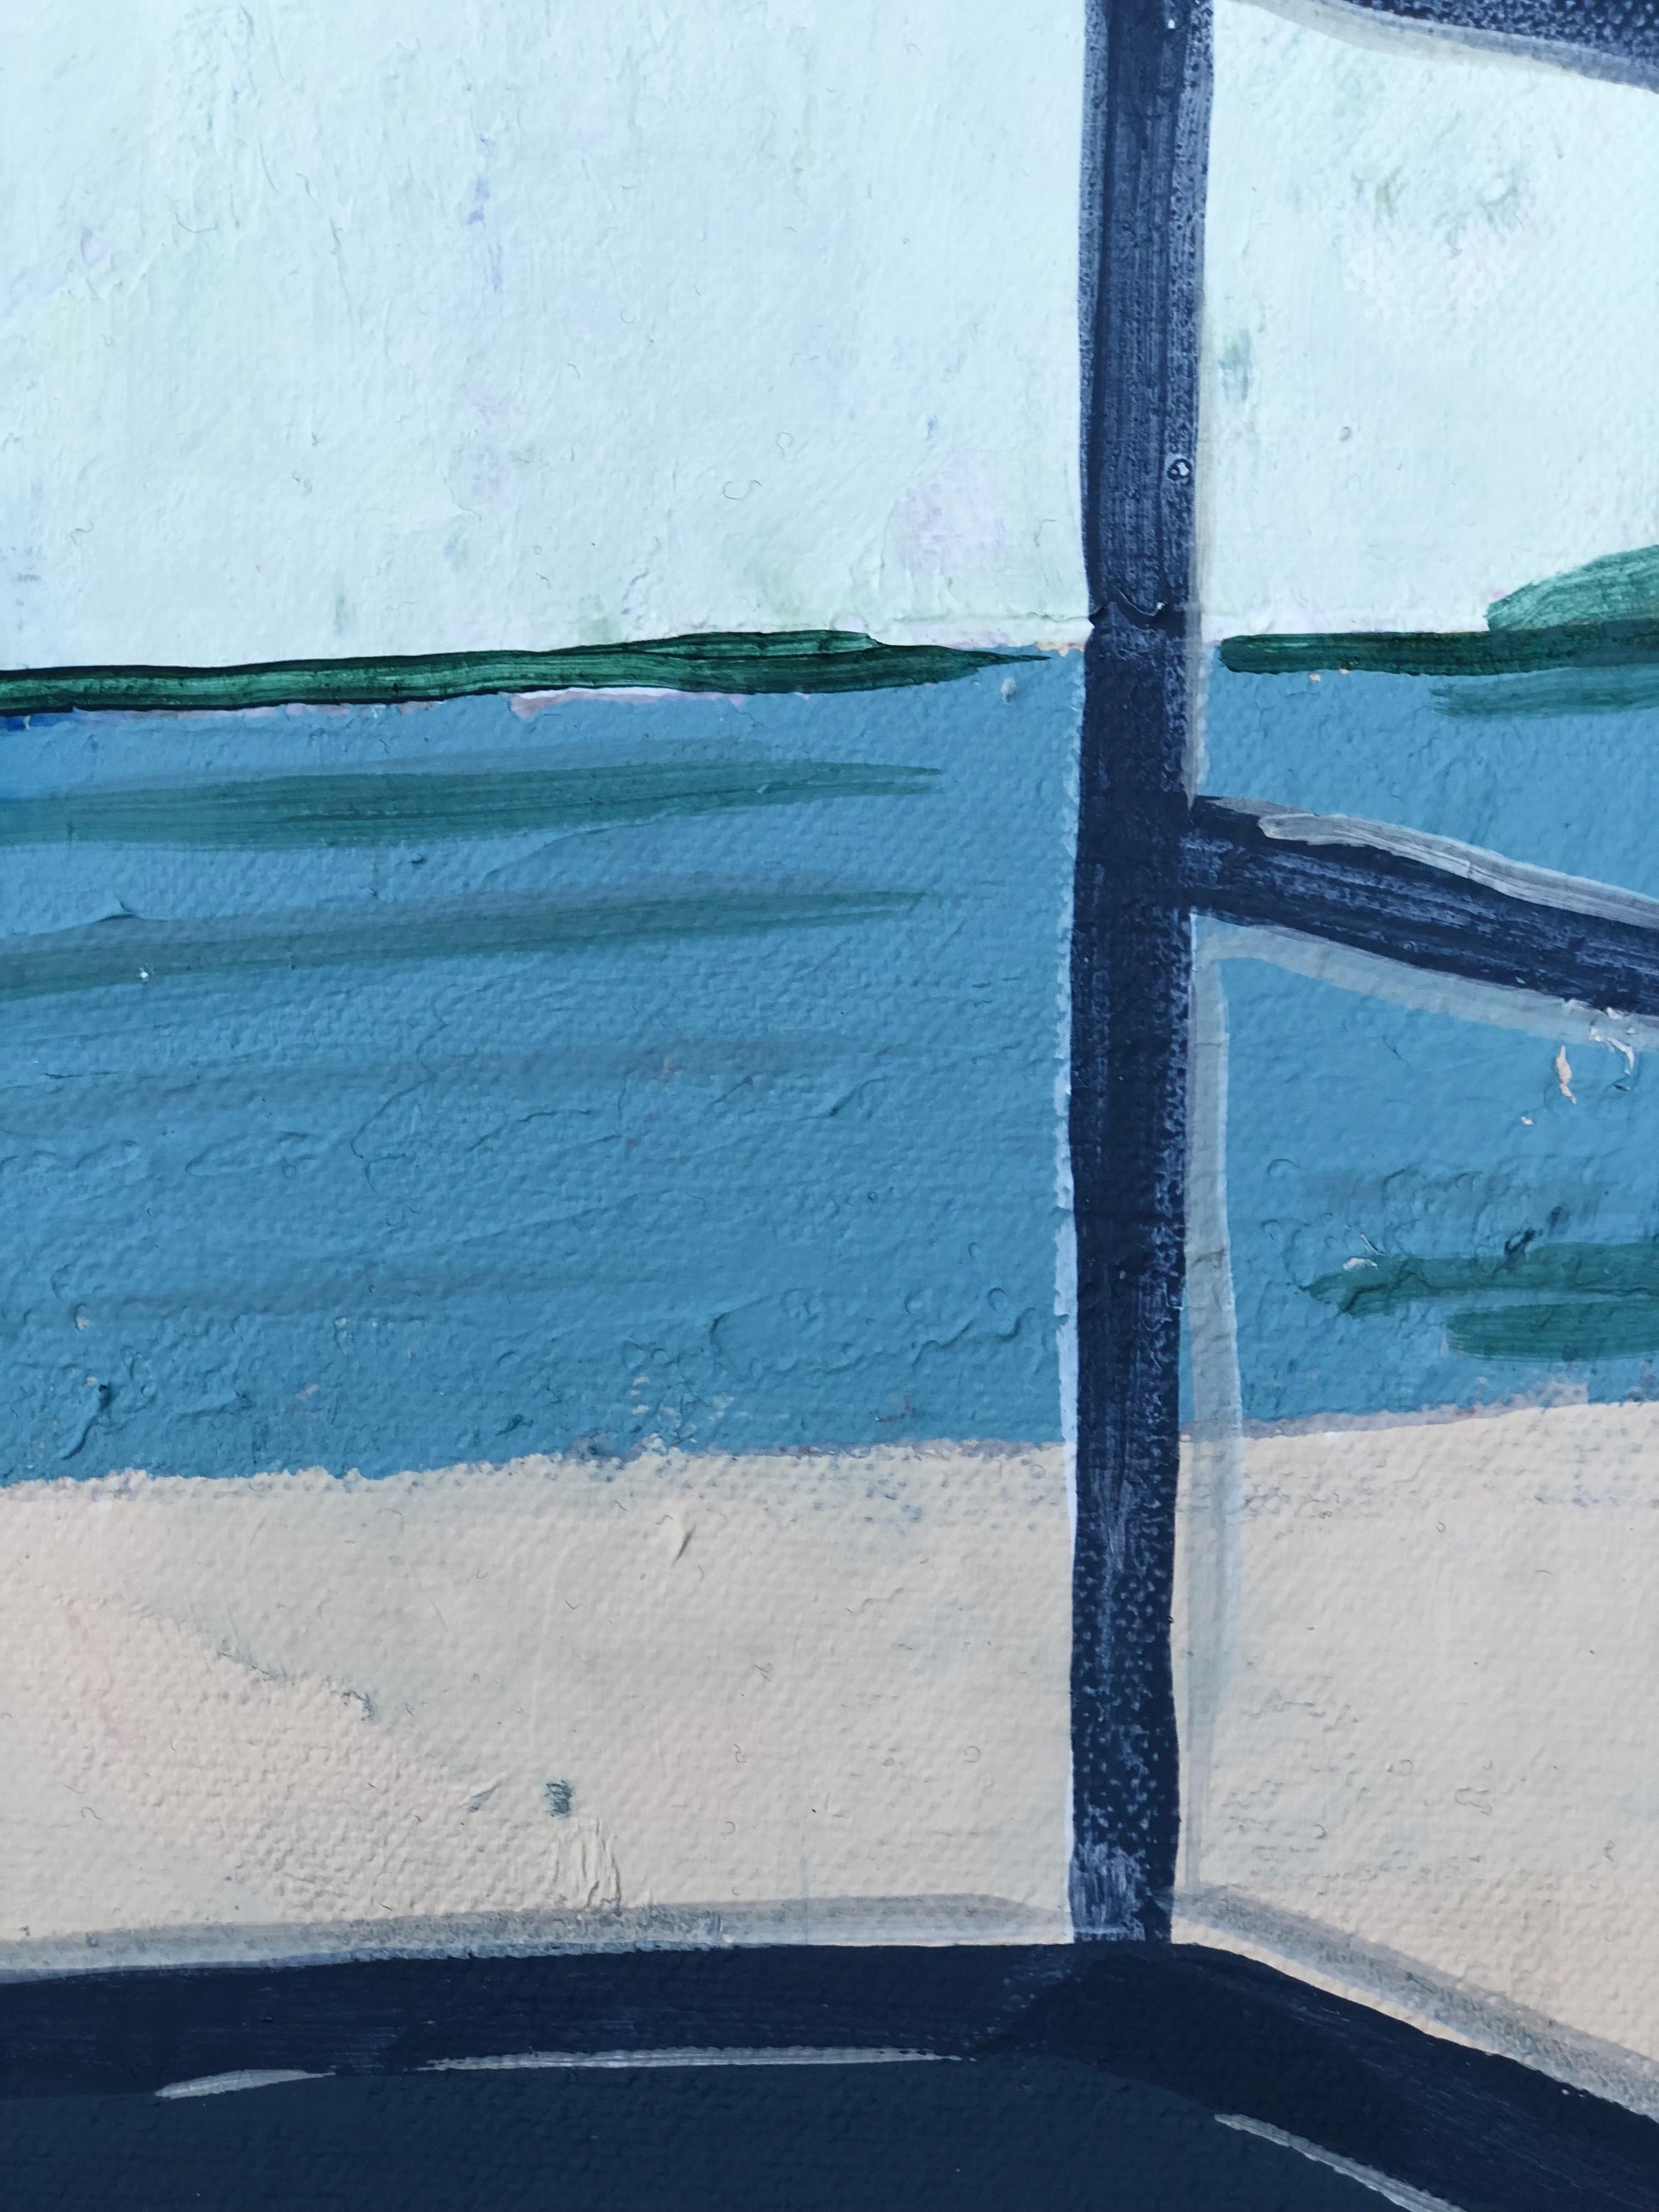 Set Sail on Naragansett Sound (8x8)